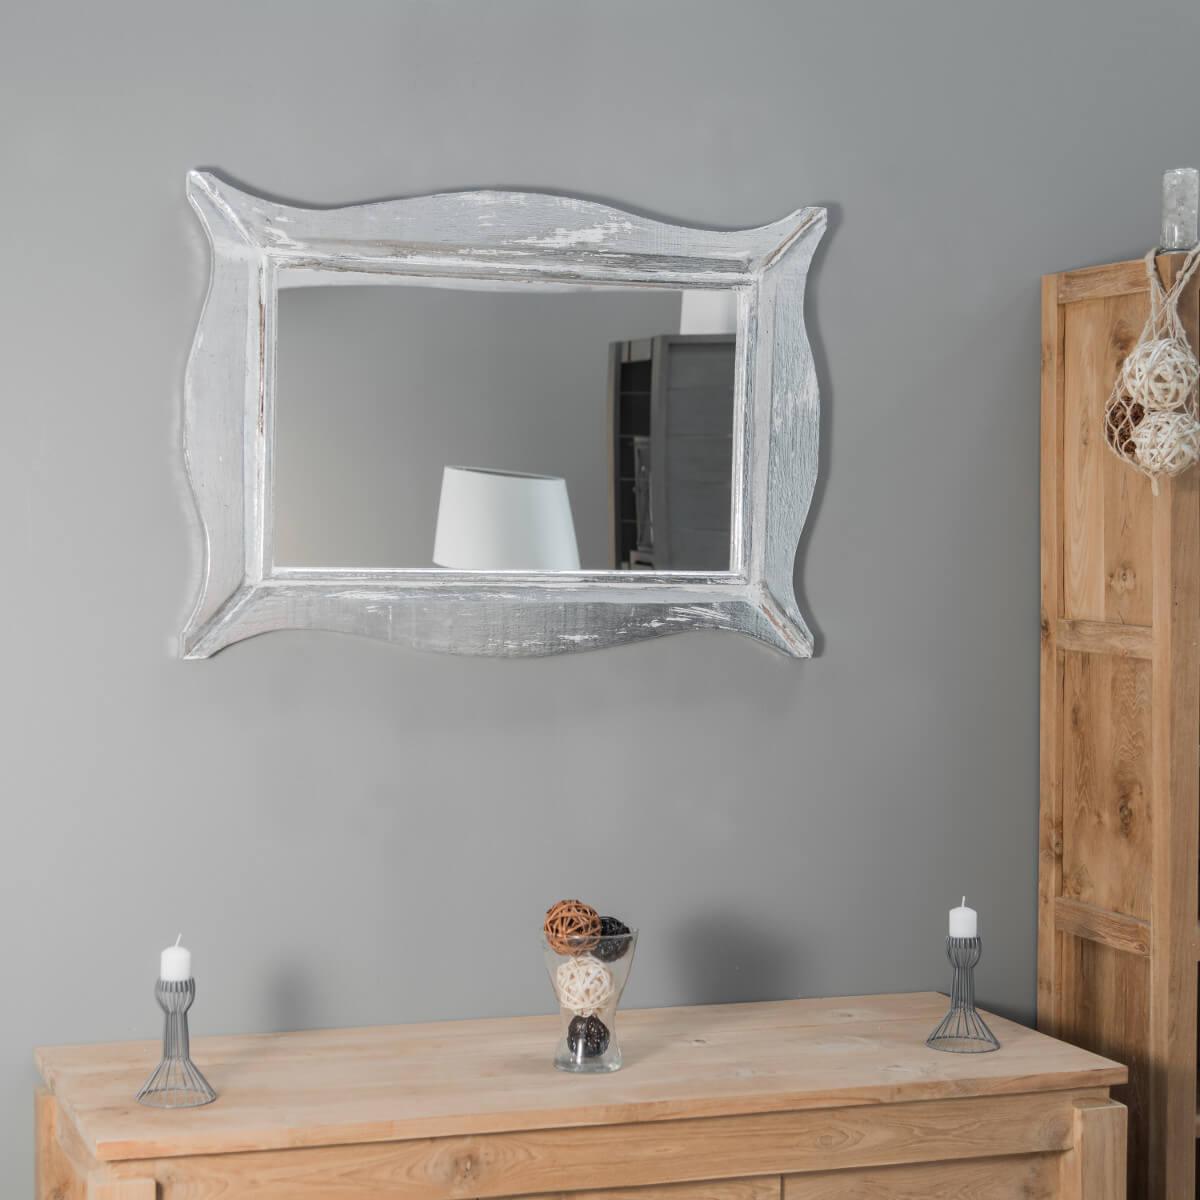 miroir moderne en bois patin blanc argent 70cm x 100cm. Black Bedroom Furniture Sets. Home Design Ideas